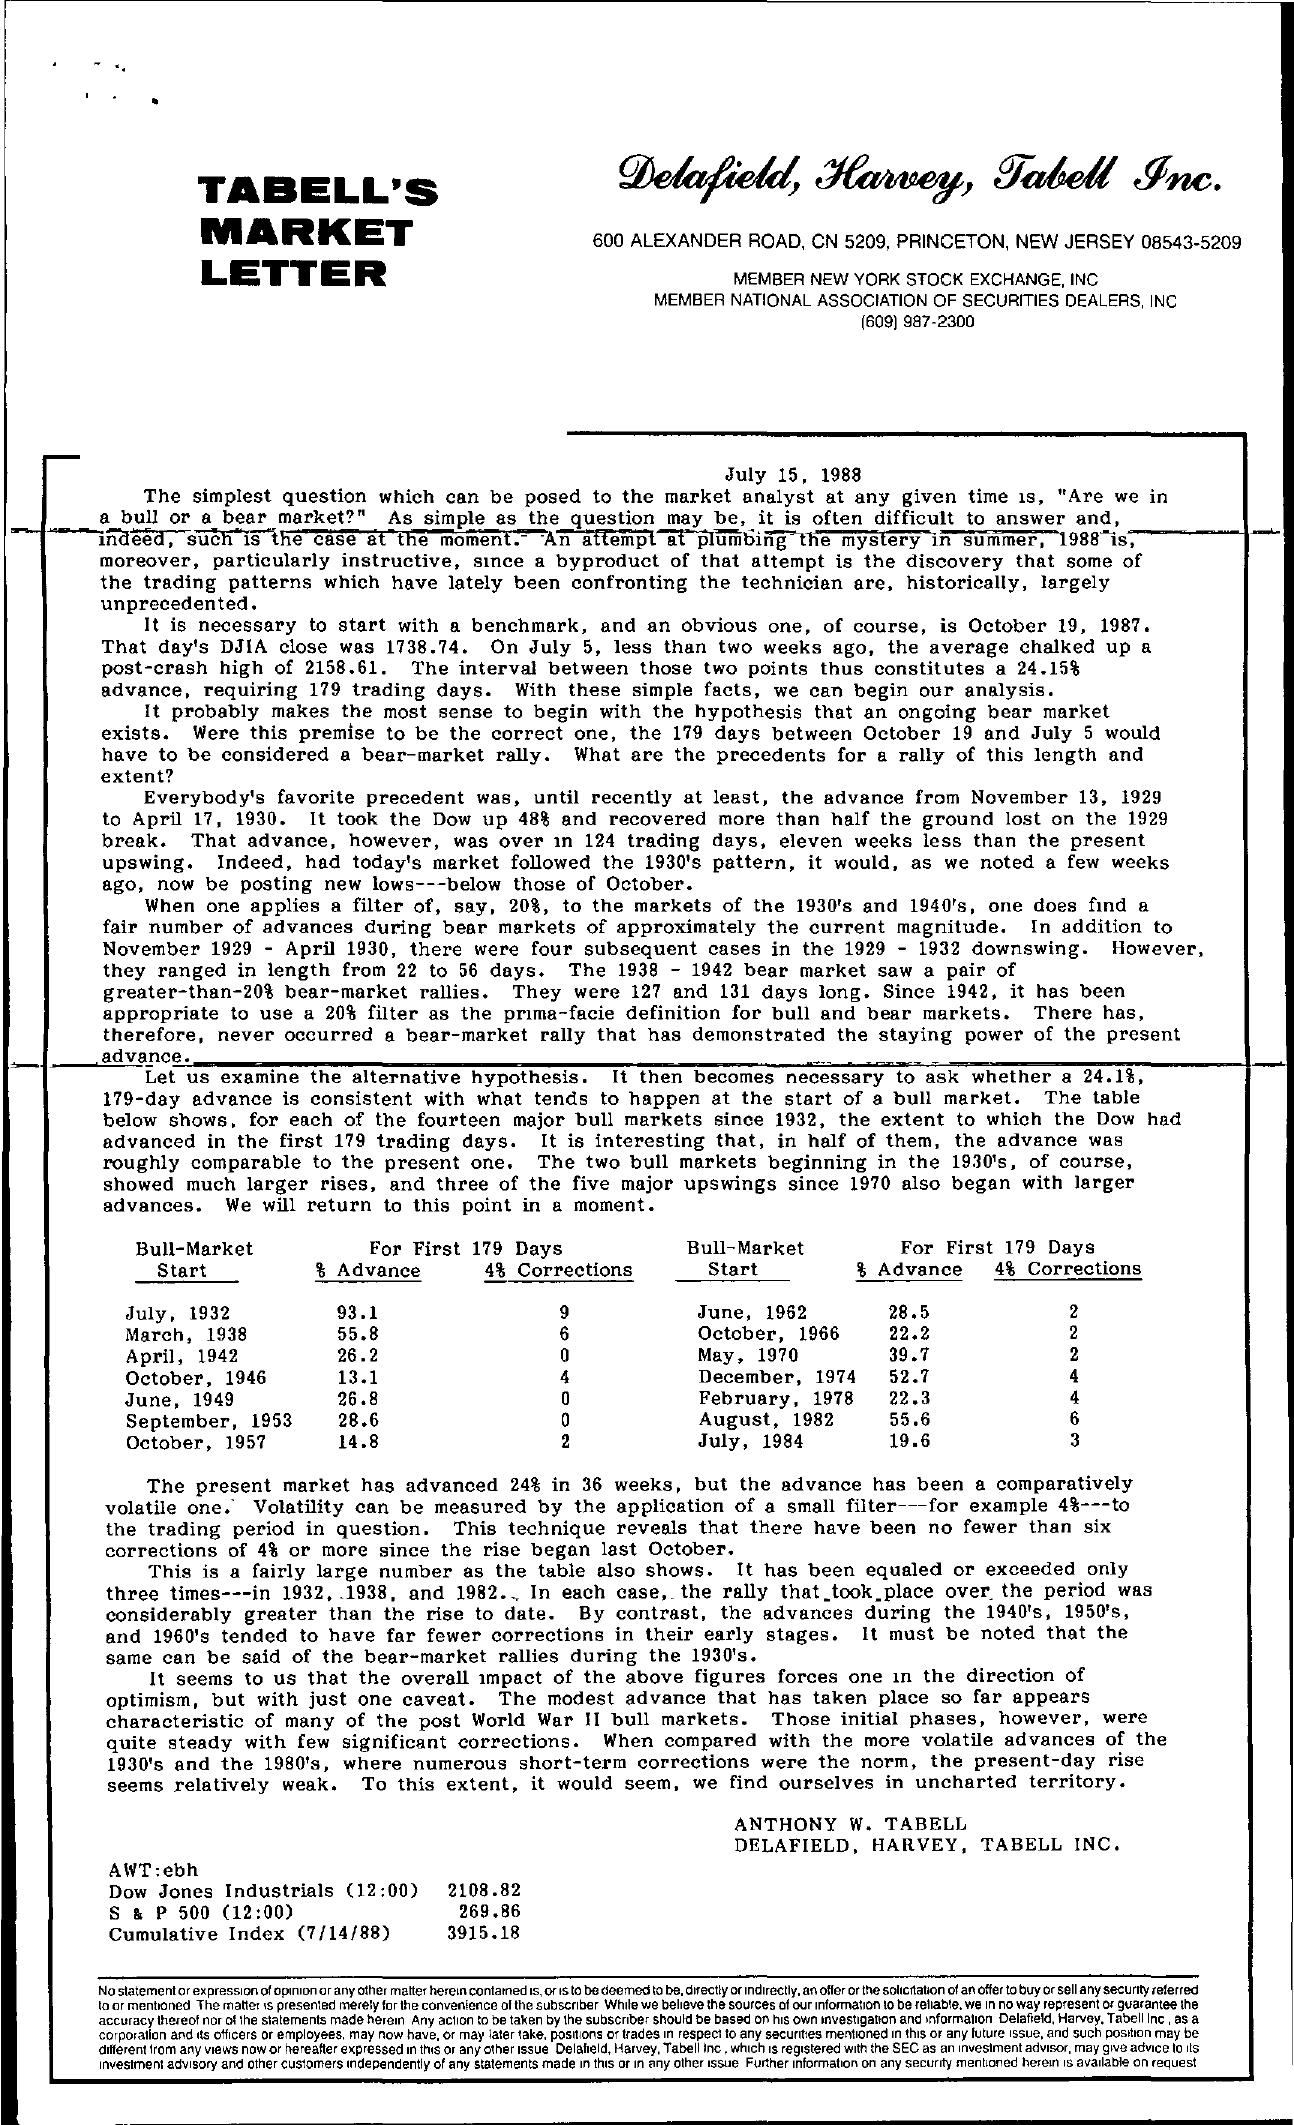 Tabell's Market Letter - July 15, 1988